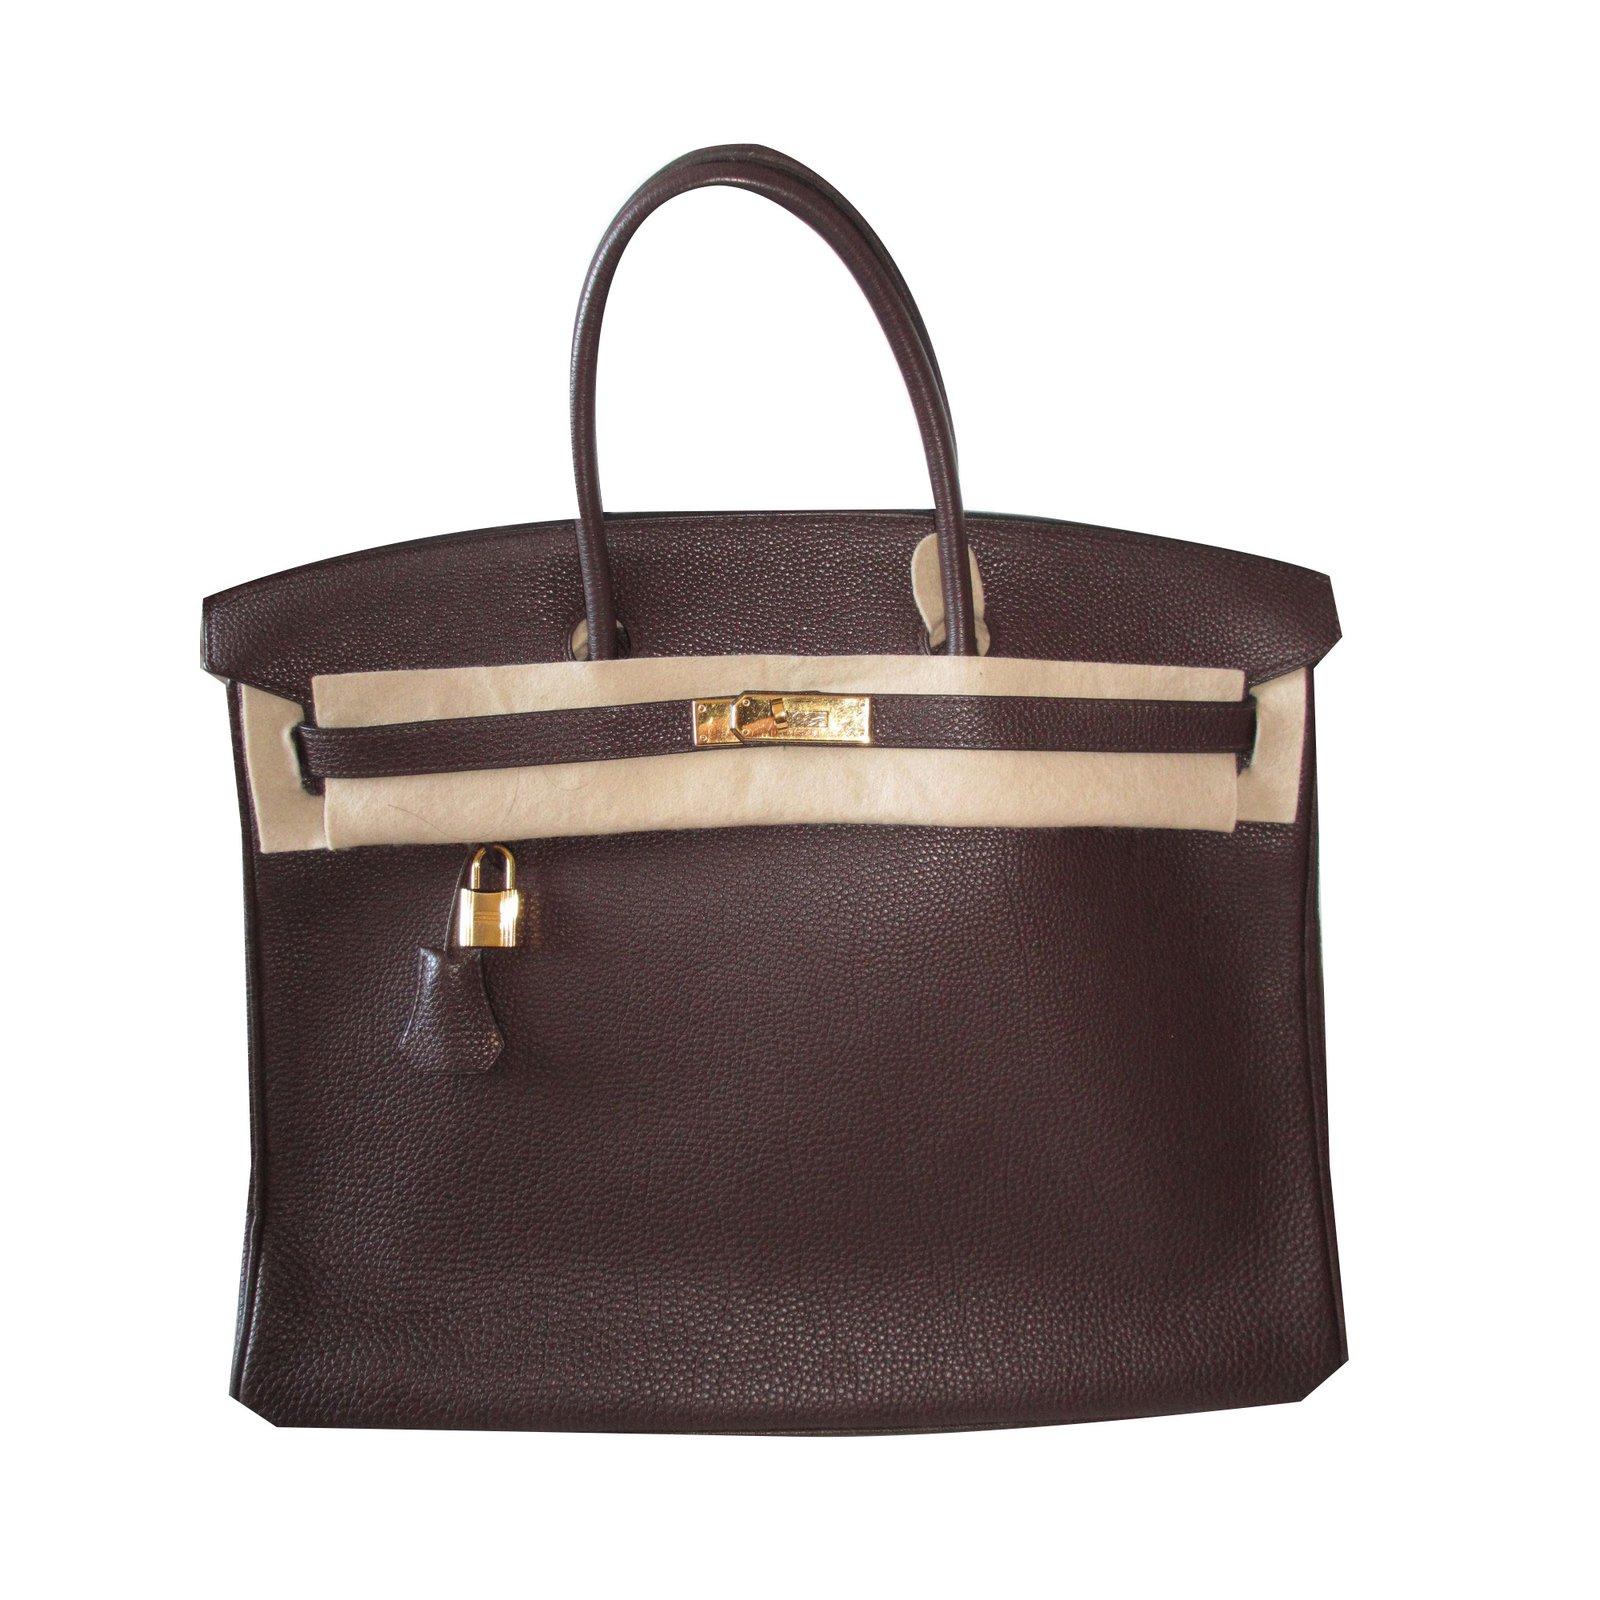 Sacs à main Hermès Birkin 40 Veau Togo Cuir Marron foncé ref.39542 ... 7f26e08554f